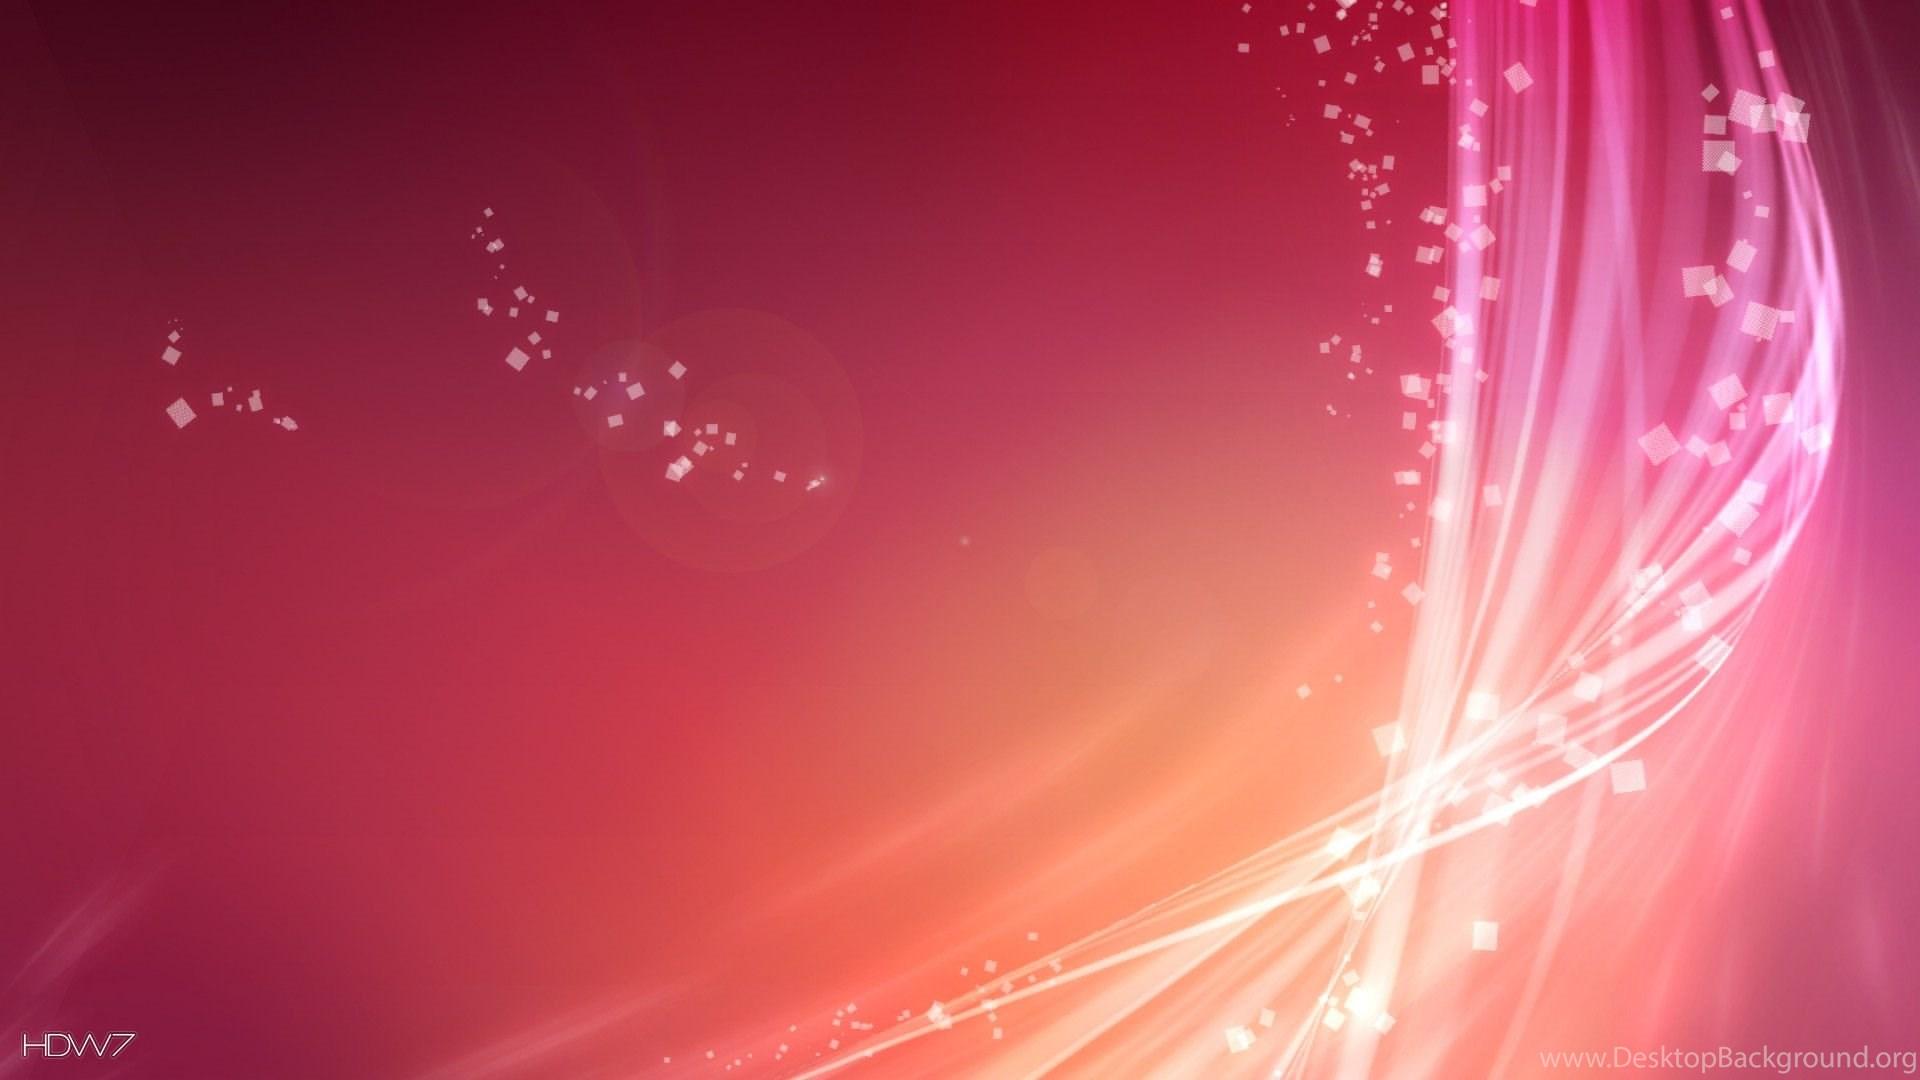 Abstract Pink Pastel Wallpapers 1080p Desktop Background